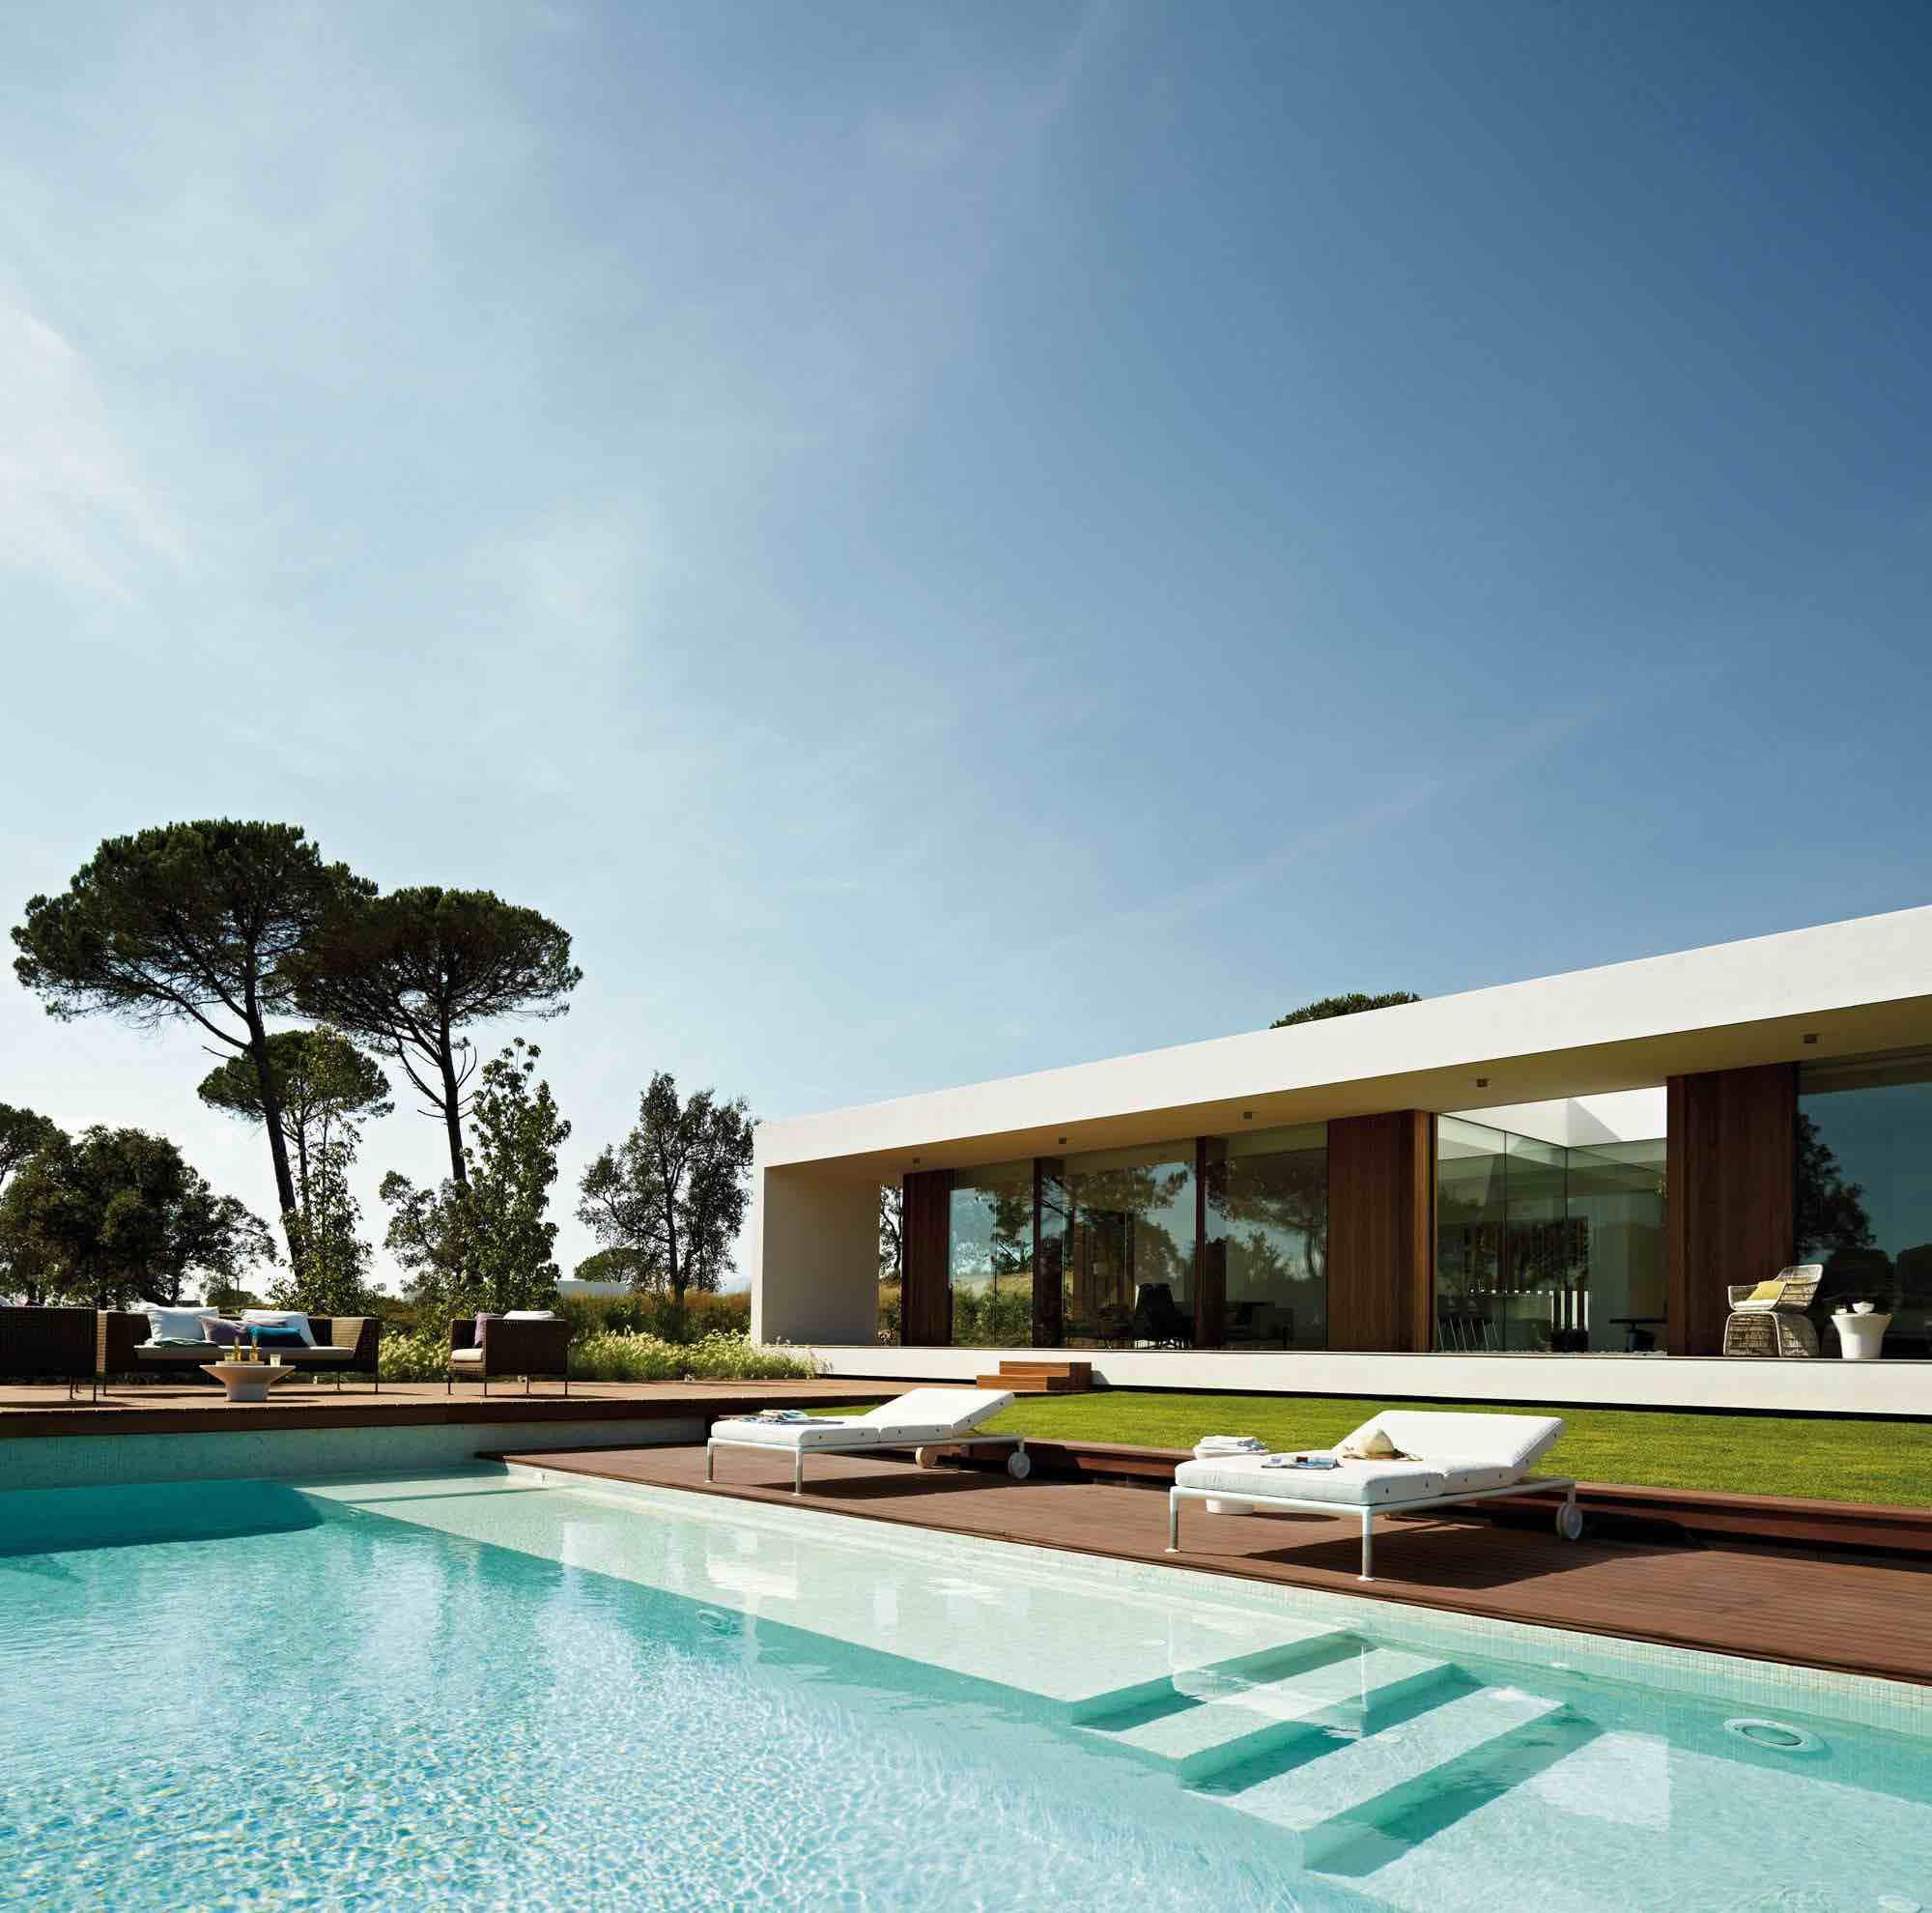 villa indigo by josep camps and olga felip caandesign architecture and home design blog. Black Bedroom Furniture Sets. Home Design Ideas